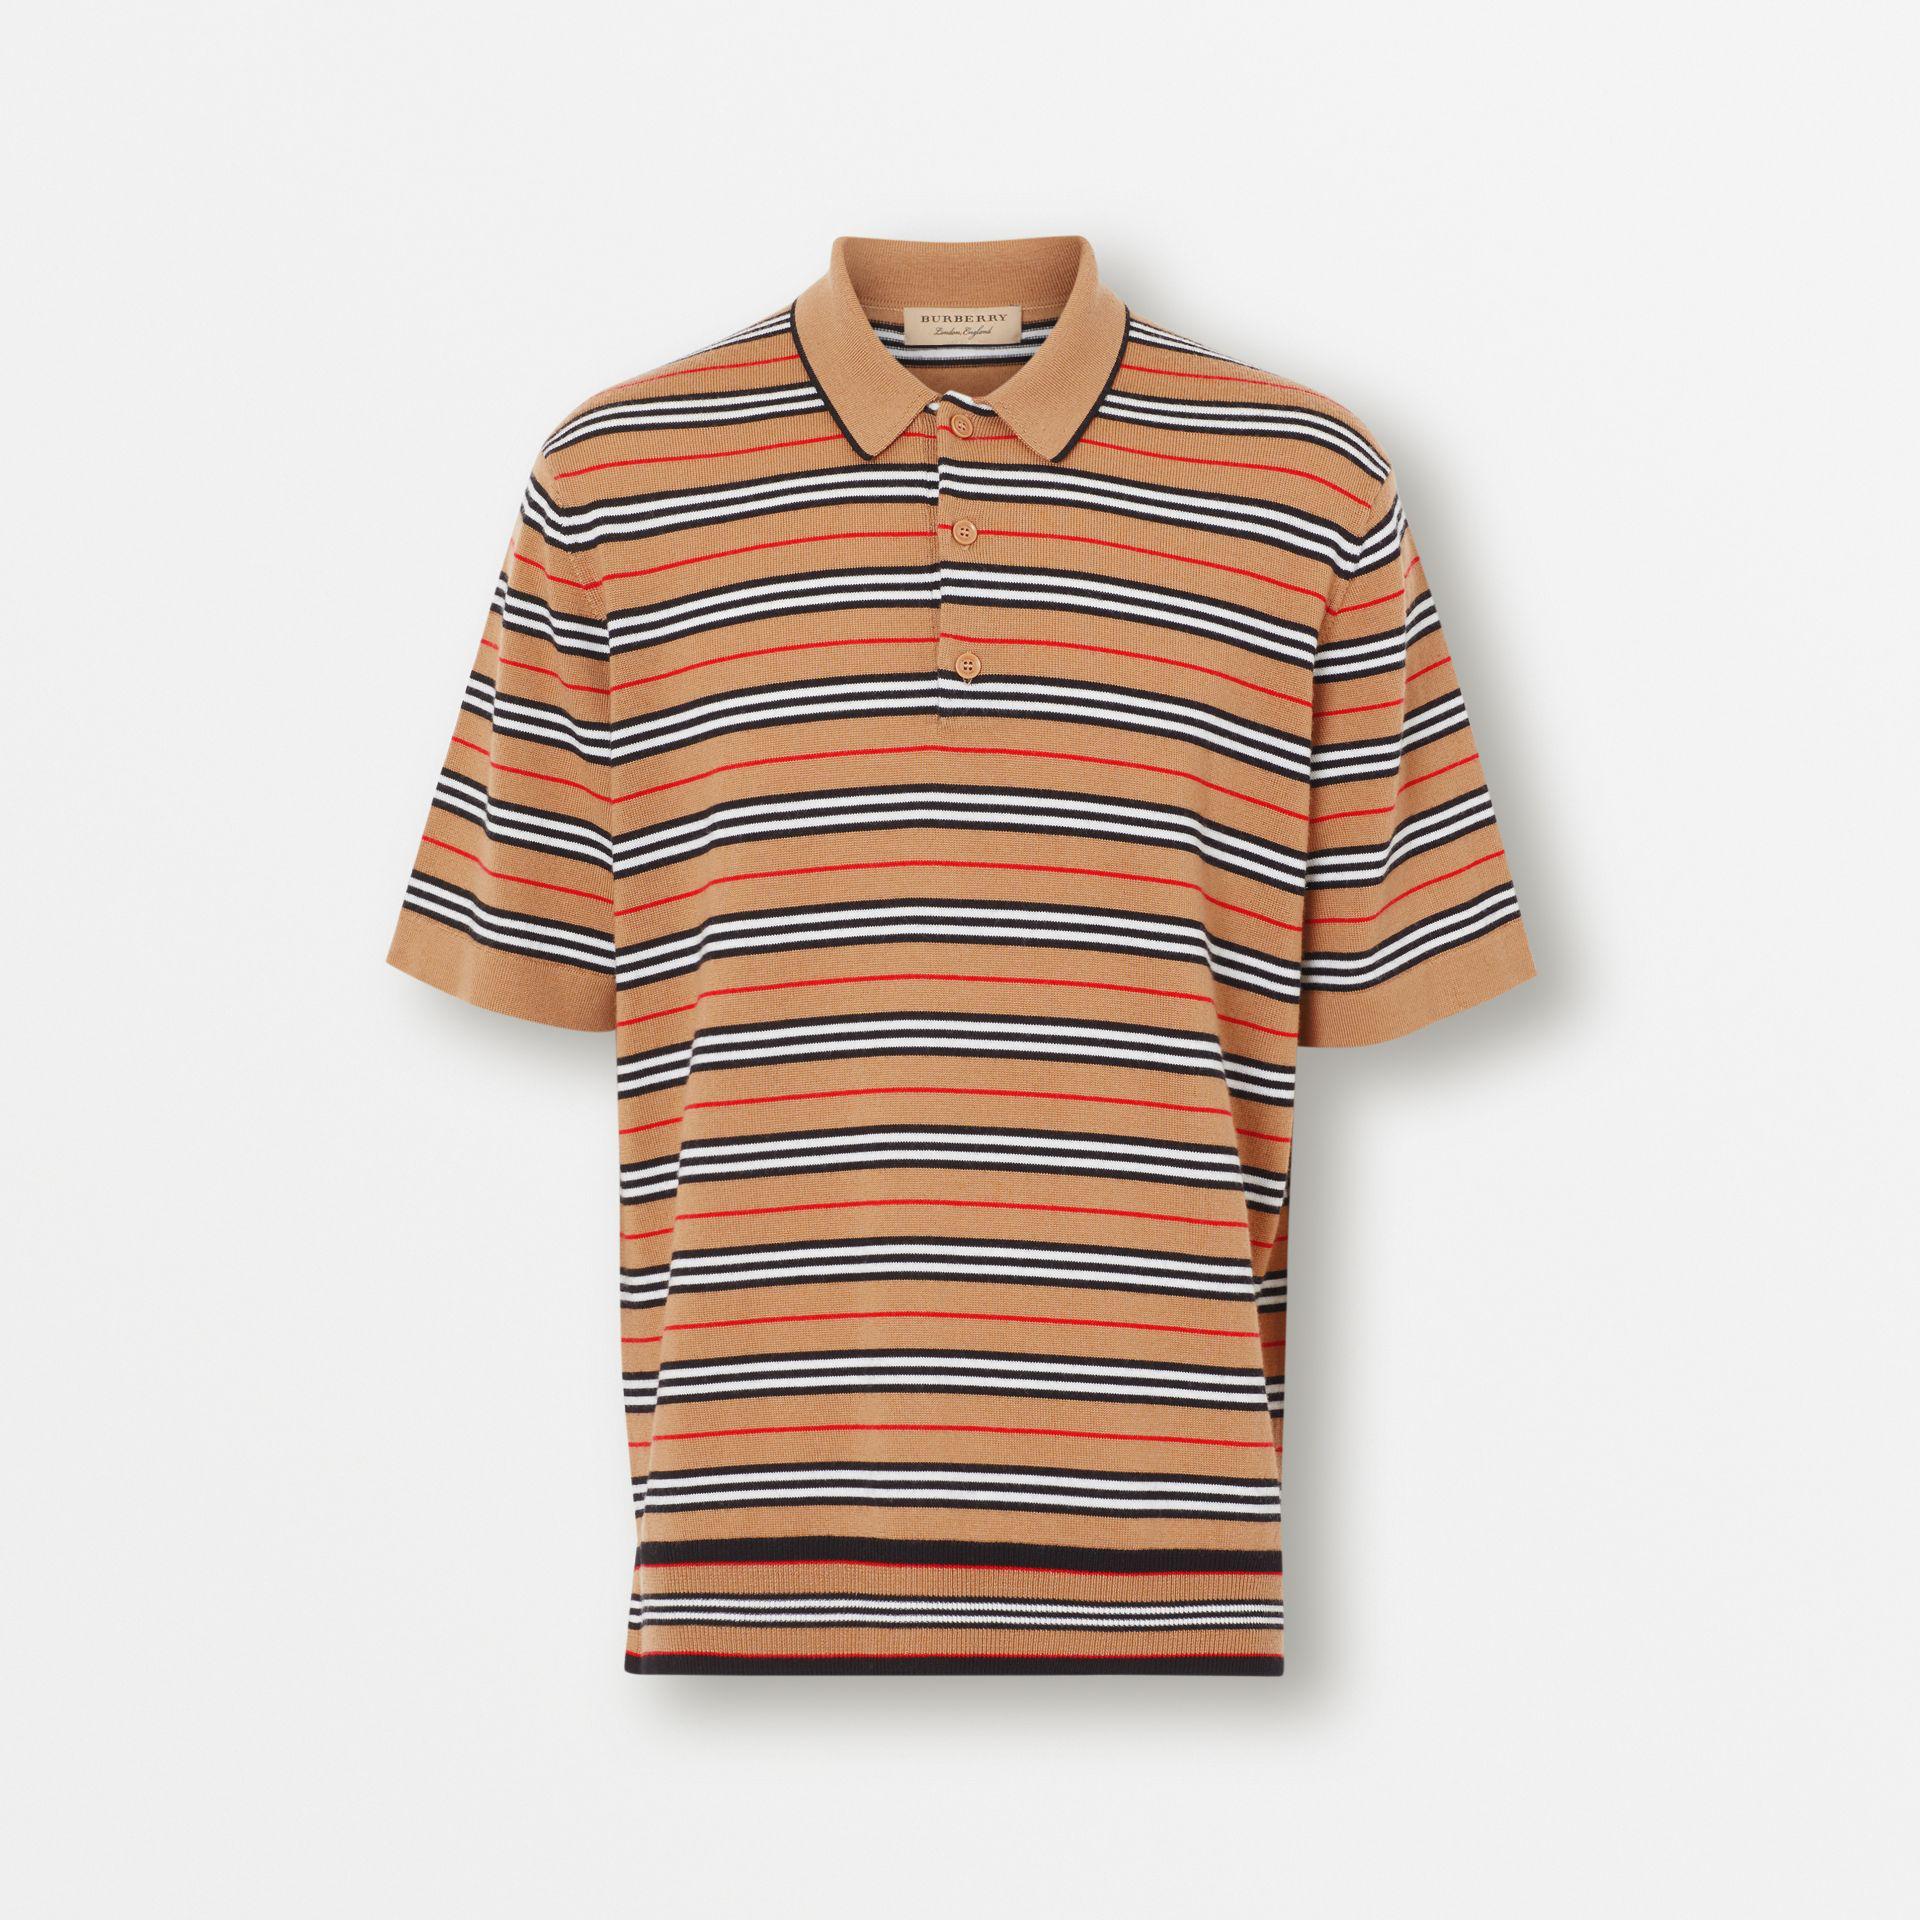 639e7189 Burberry Men's Beaford Striped Wool Polo Shirt In Yellow   ModeSens